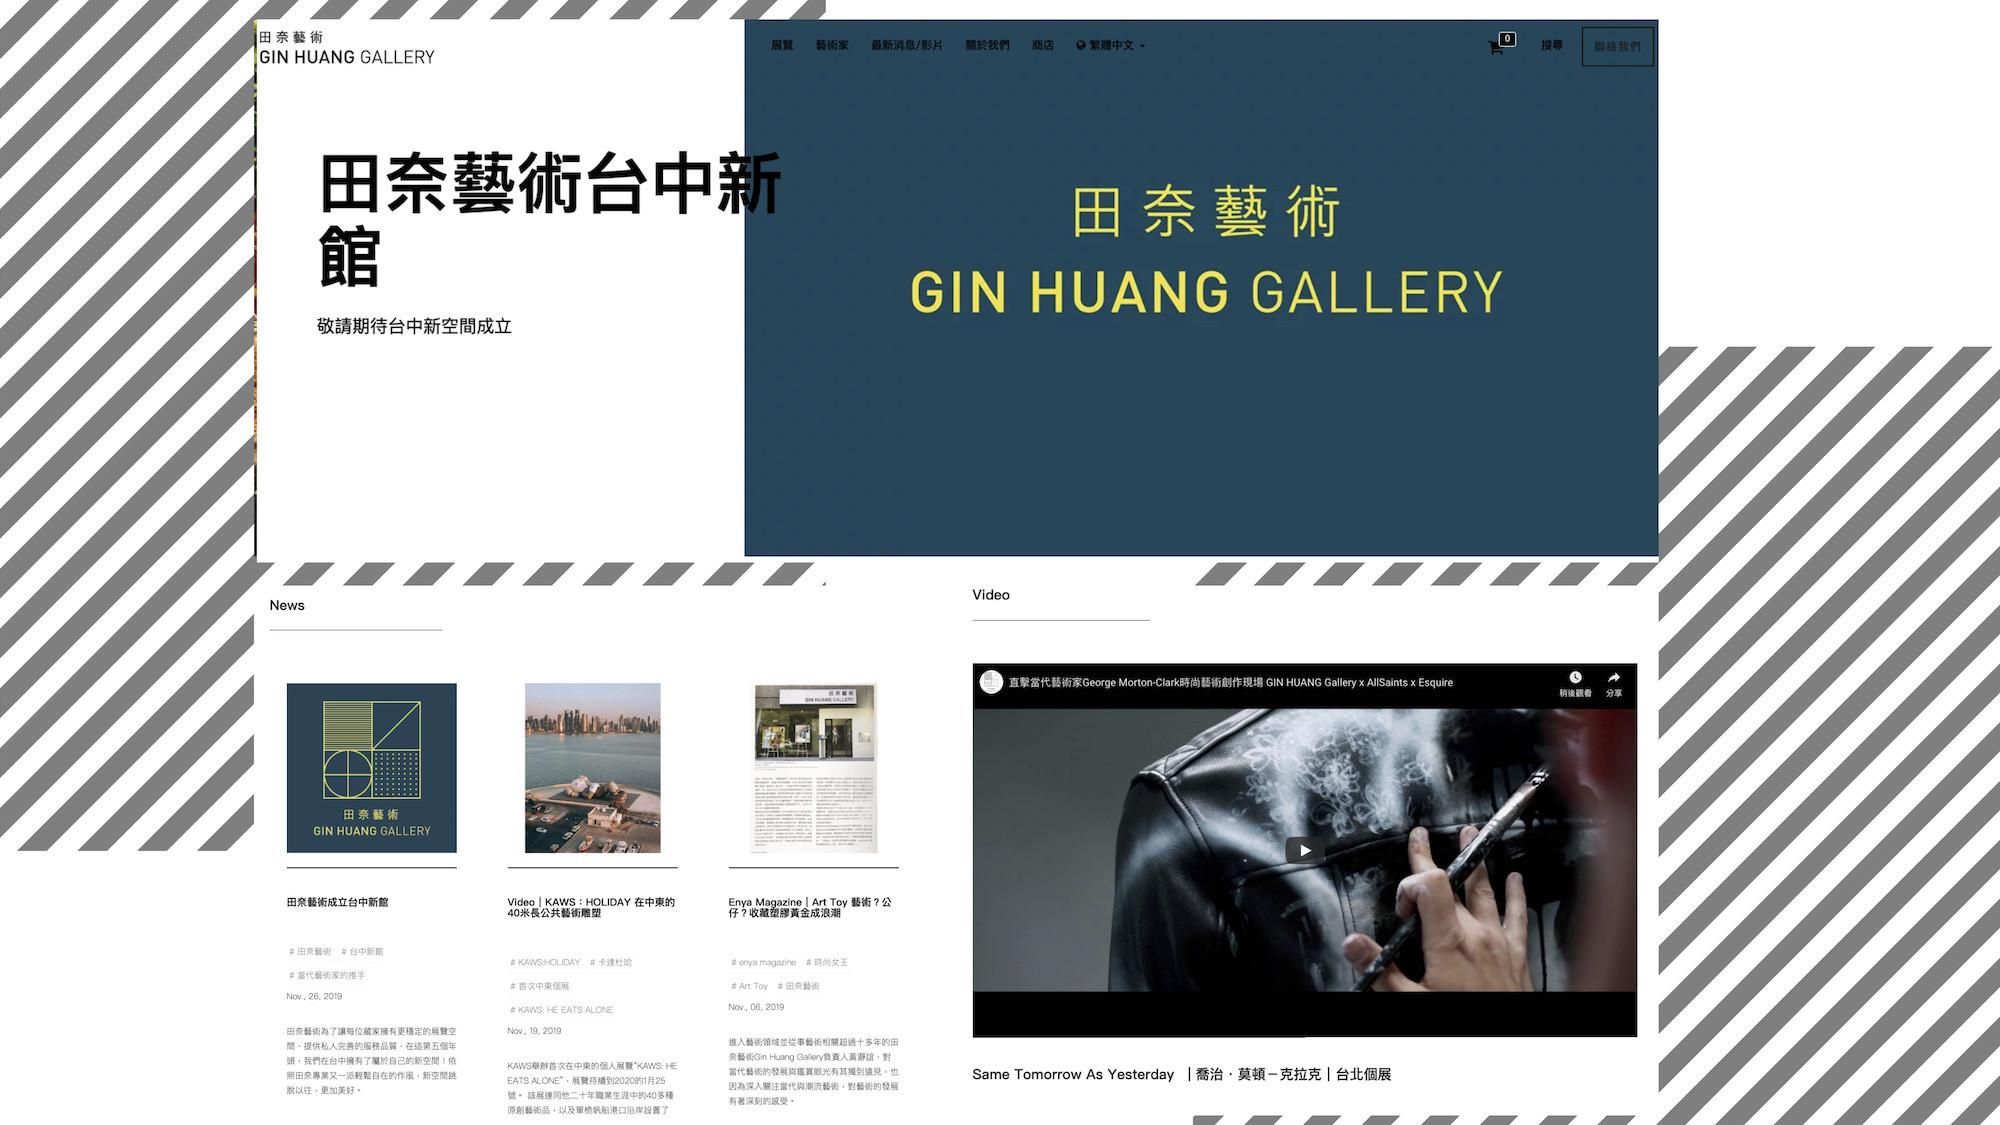 田奈藝術 網頁設計風格